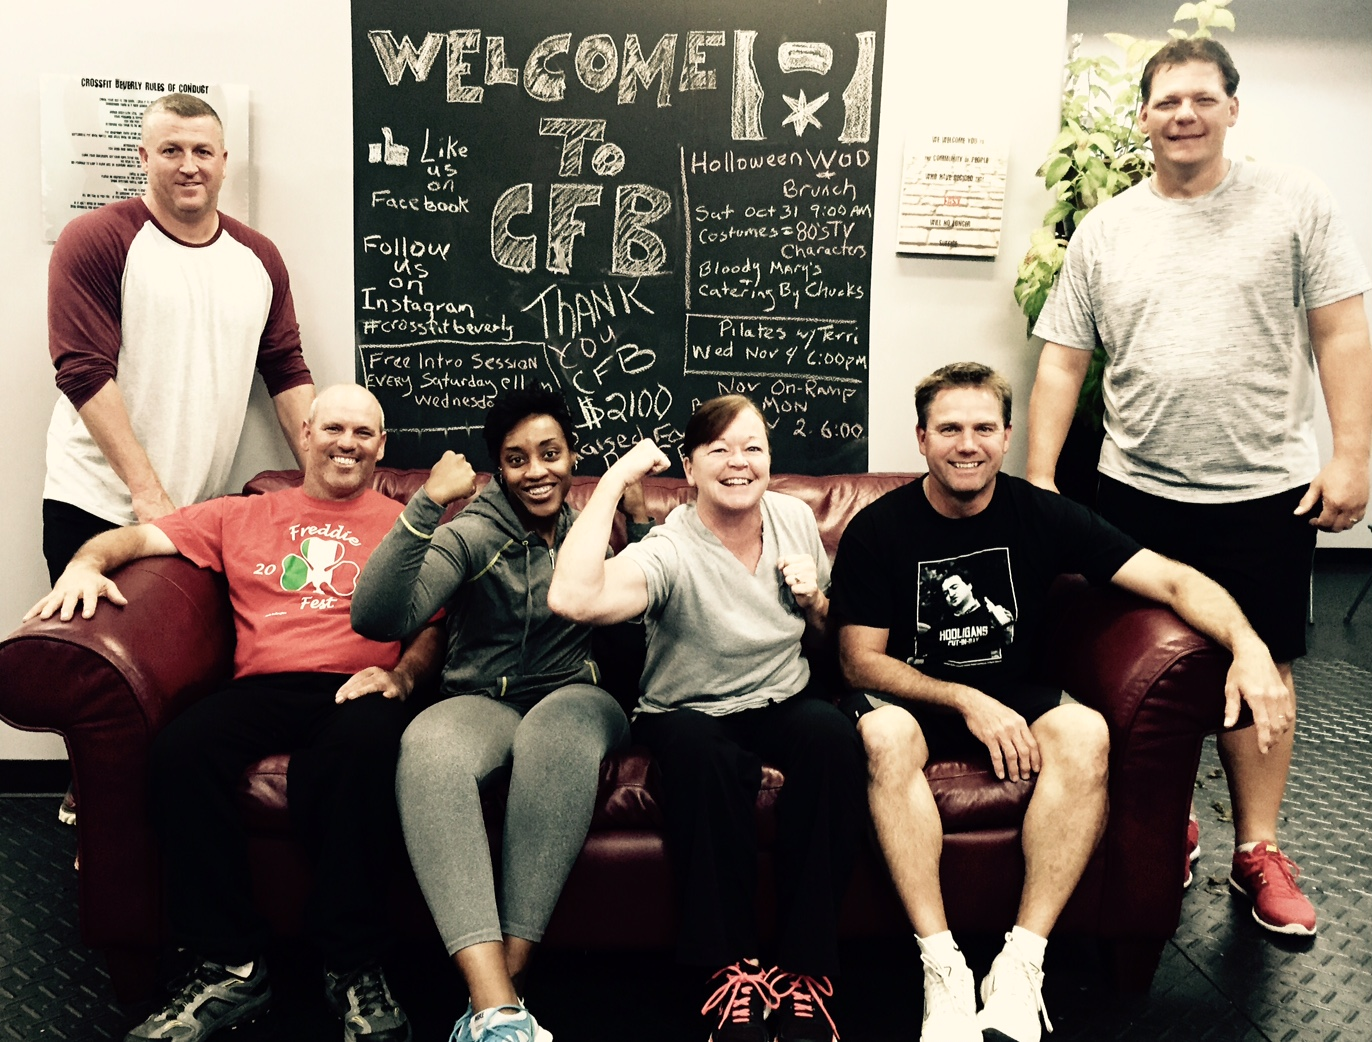 Congratulations October On-Ramp From Left:Mickey, Joe, Adrena, Liz, Mike, Jason